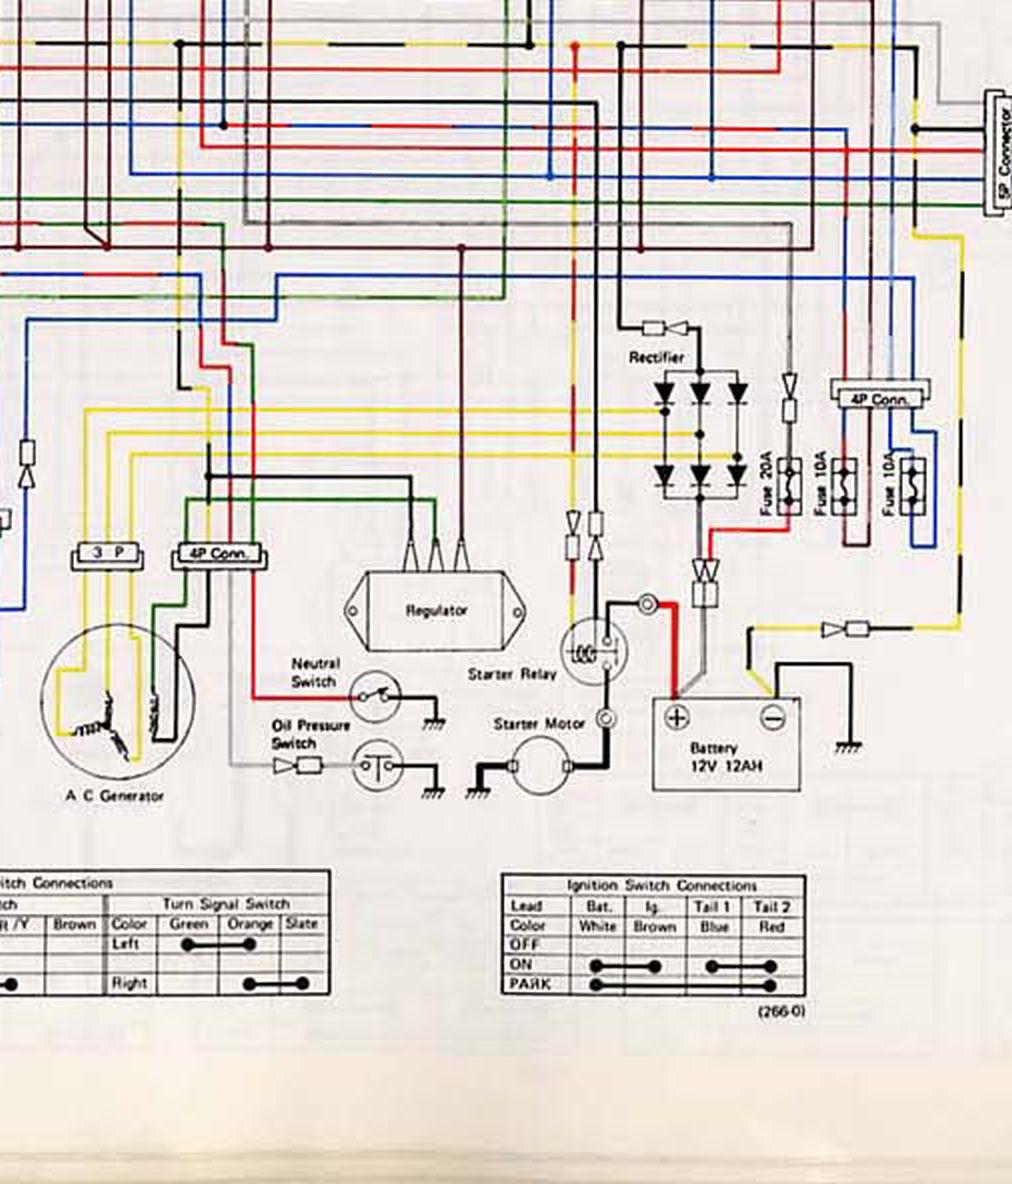 hight resolution of kz 400 d4 us wiring zoom jpg